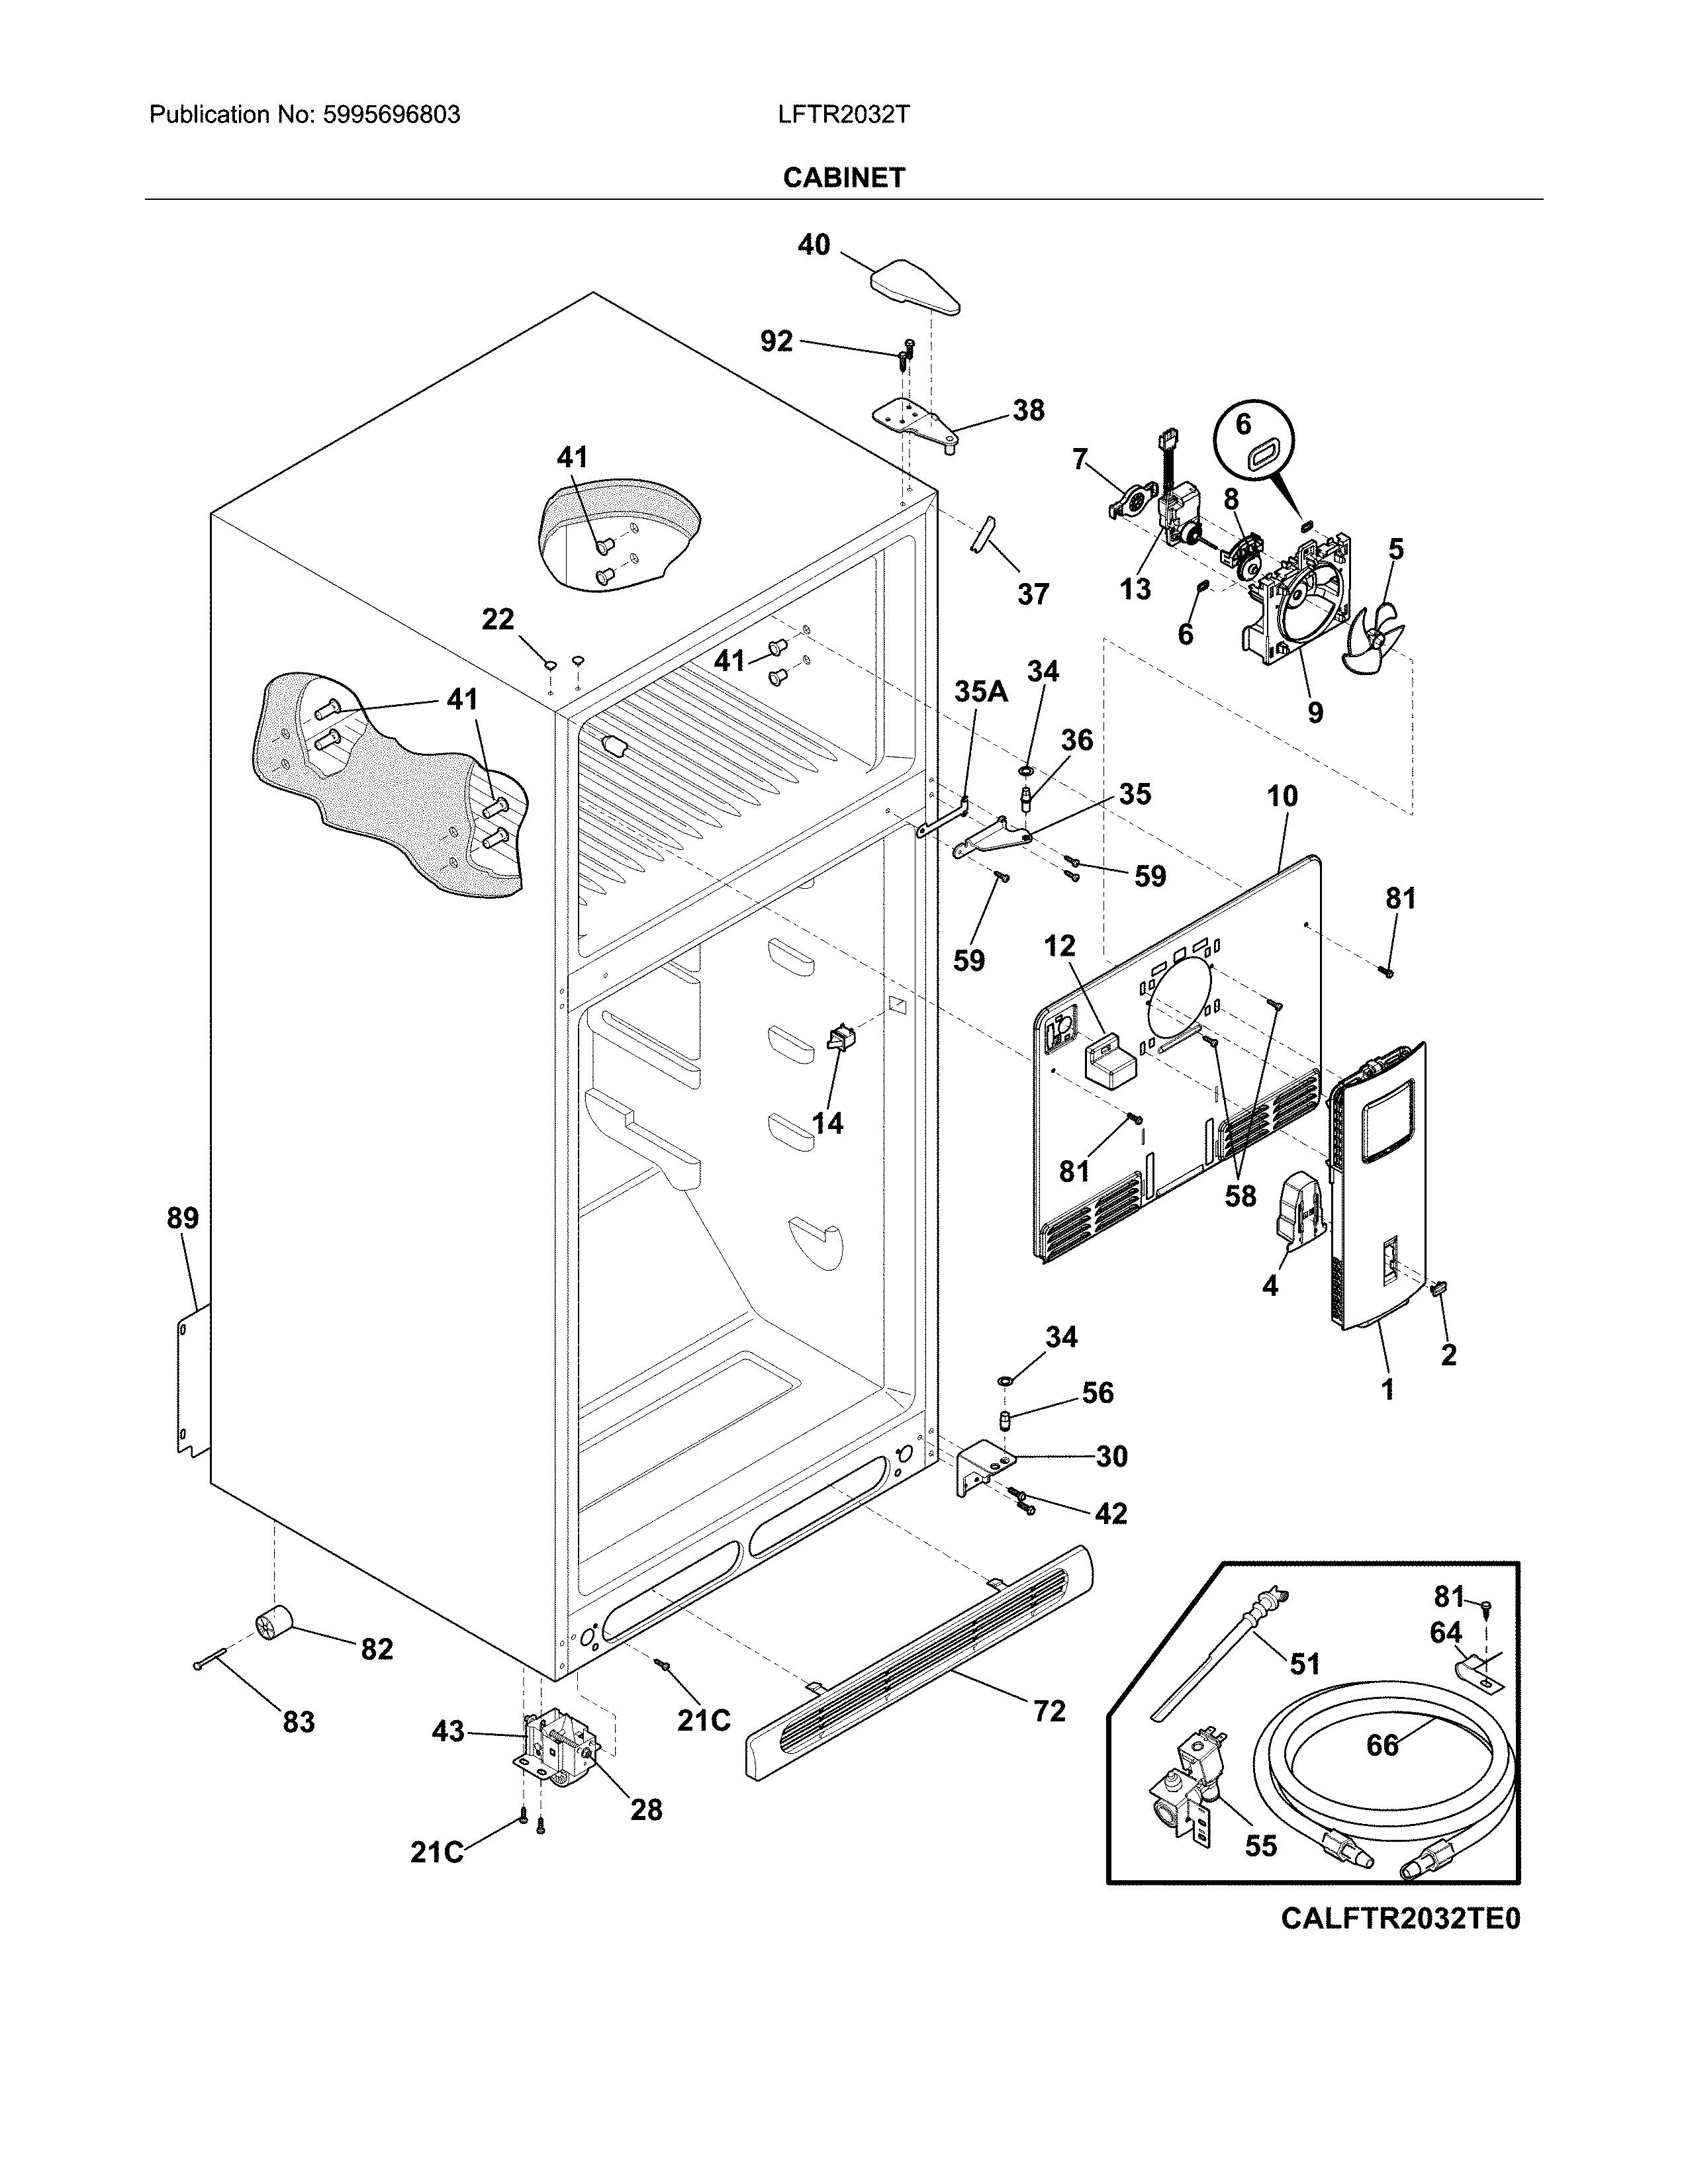 Frigidaire model LFTR2032TF1 top-mount refrigerator